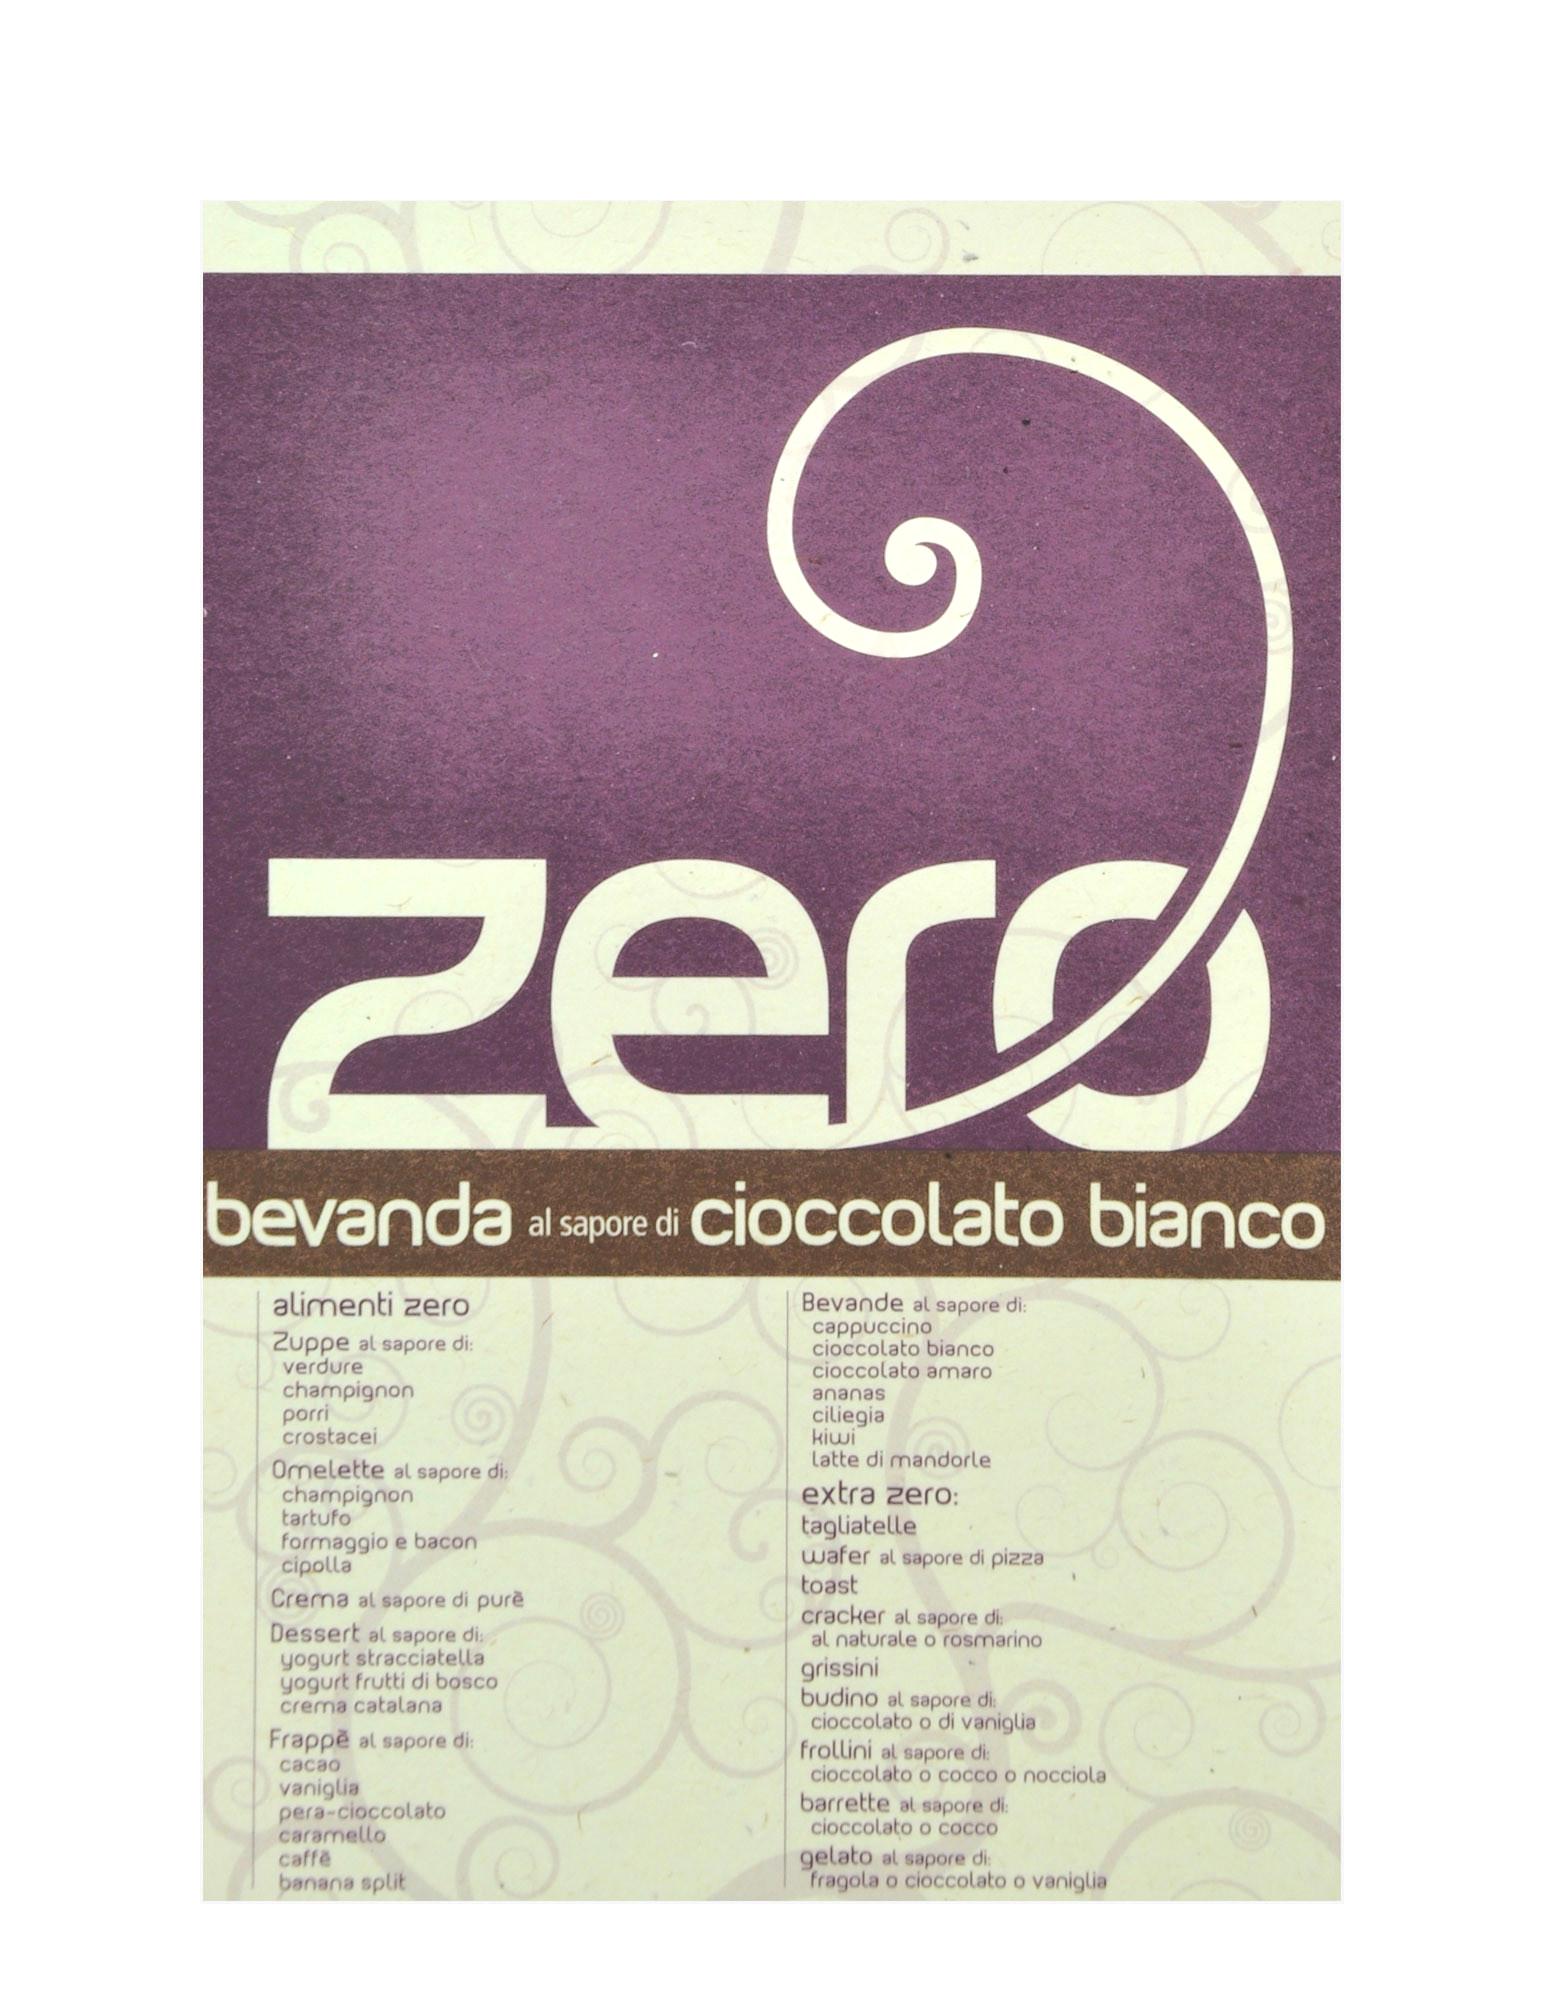 dieta zero bevanda al cioccolato